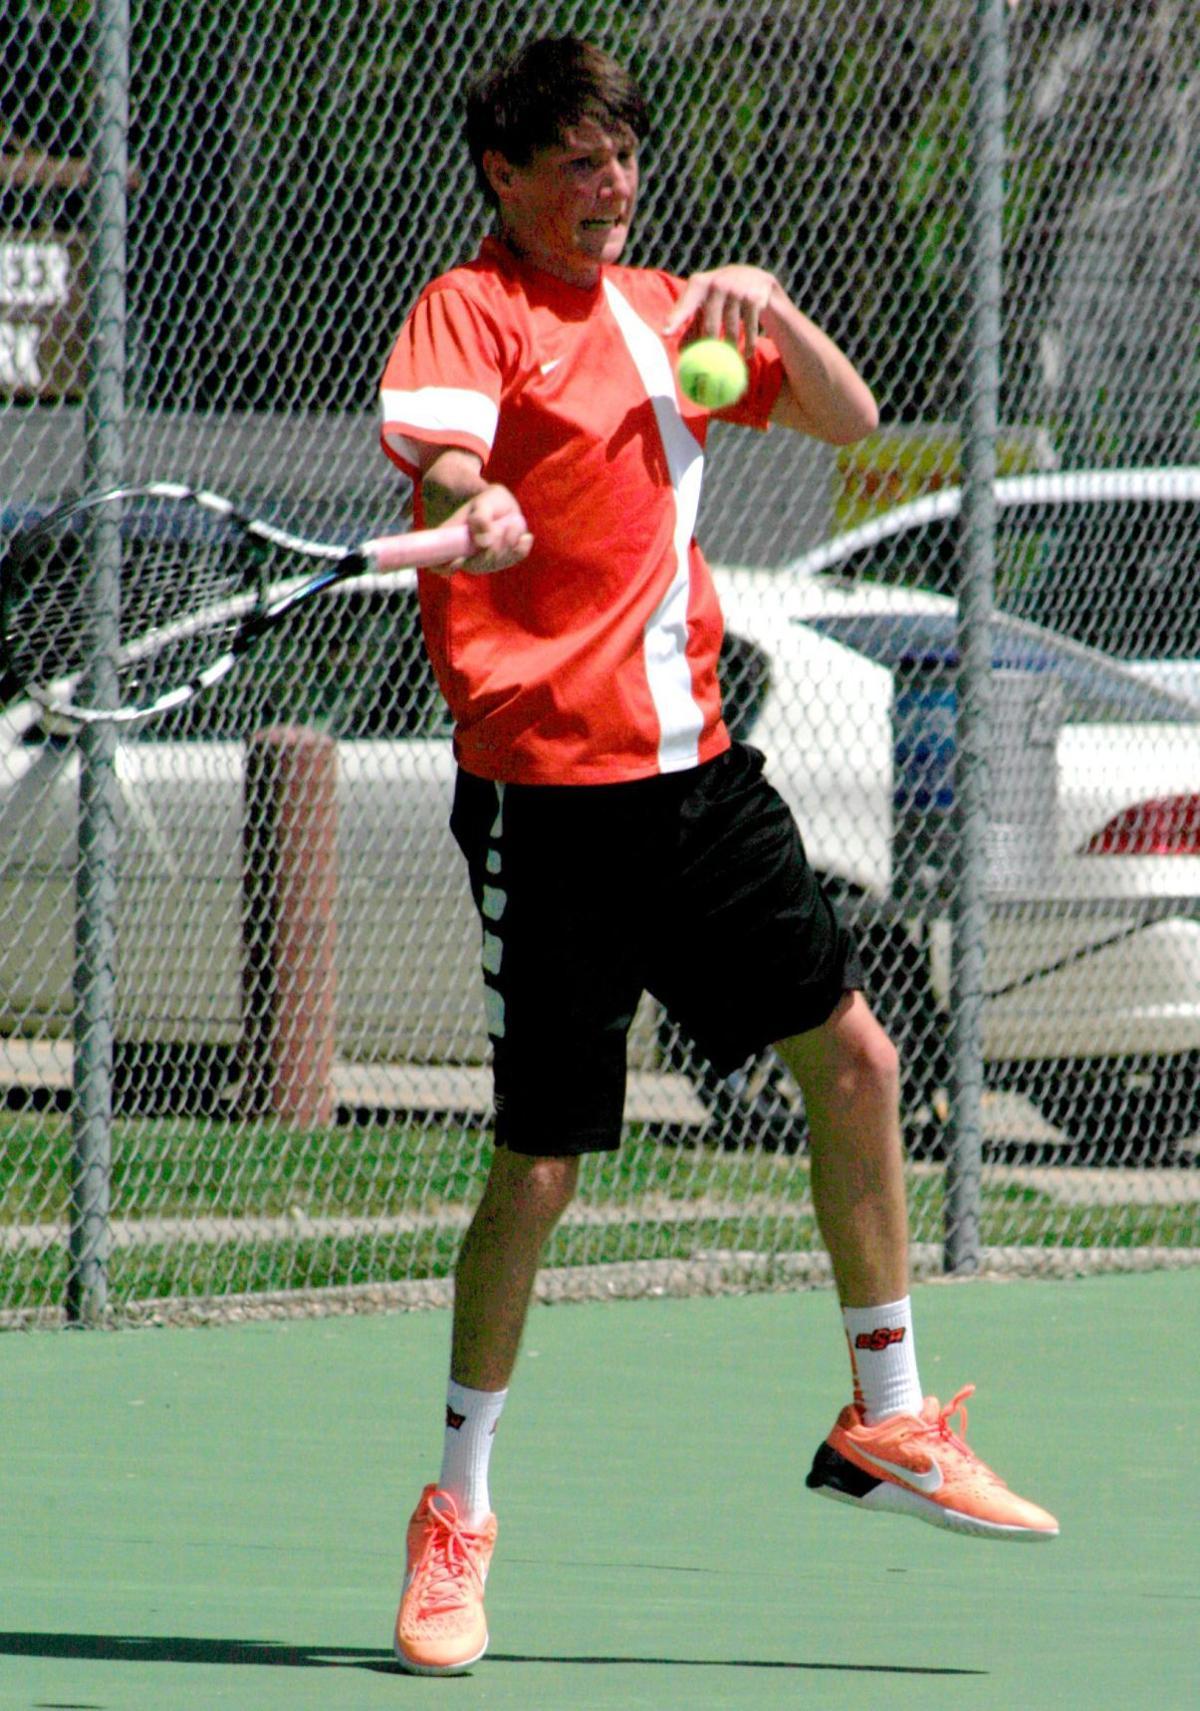 montague senior singles Doubles: keary gilsdorf-gigi montague, senior, caitlyn sheehan-jacee sprunger 6-1 singles: jay montague, senior, def roy munns 6-1, 6-1 marko foster.